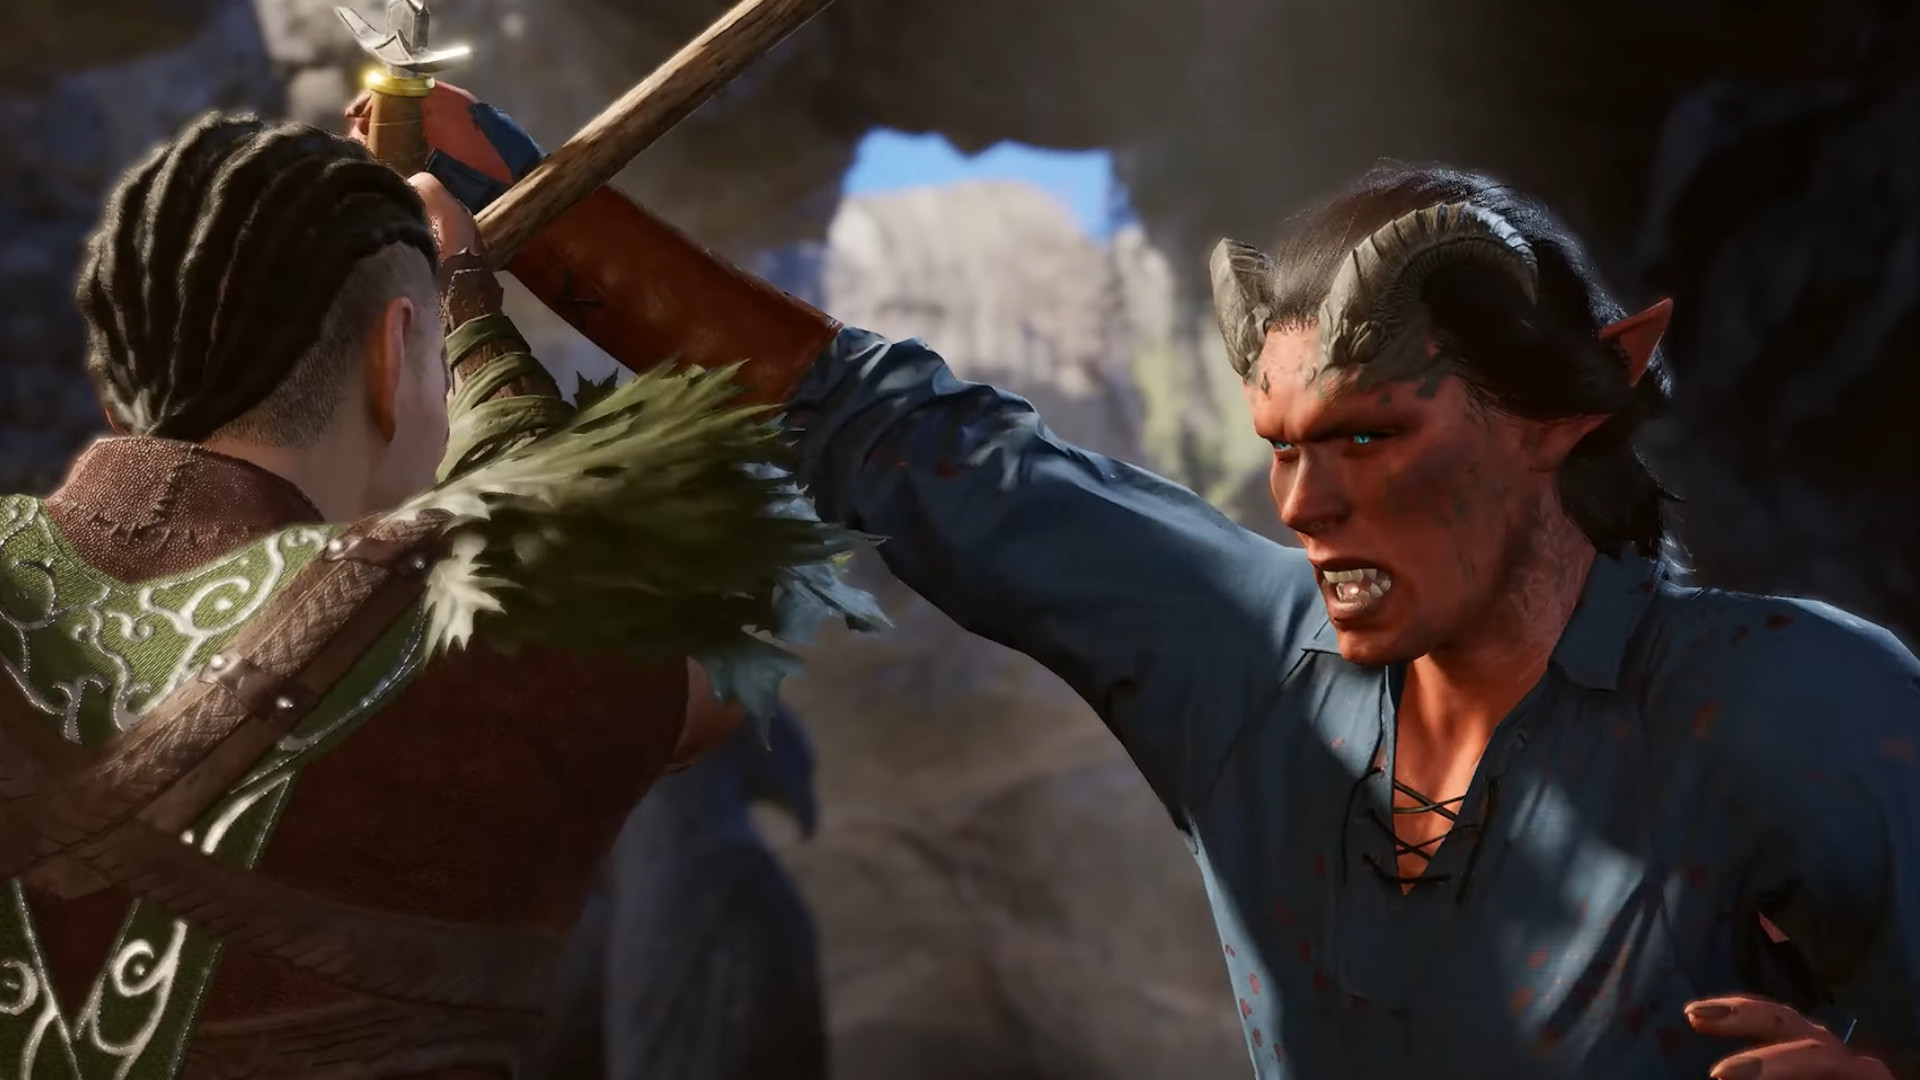 Baldur's Gate 3 gets new features in Patch 5, but no new D&D class